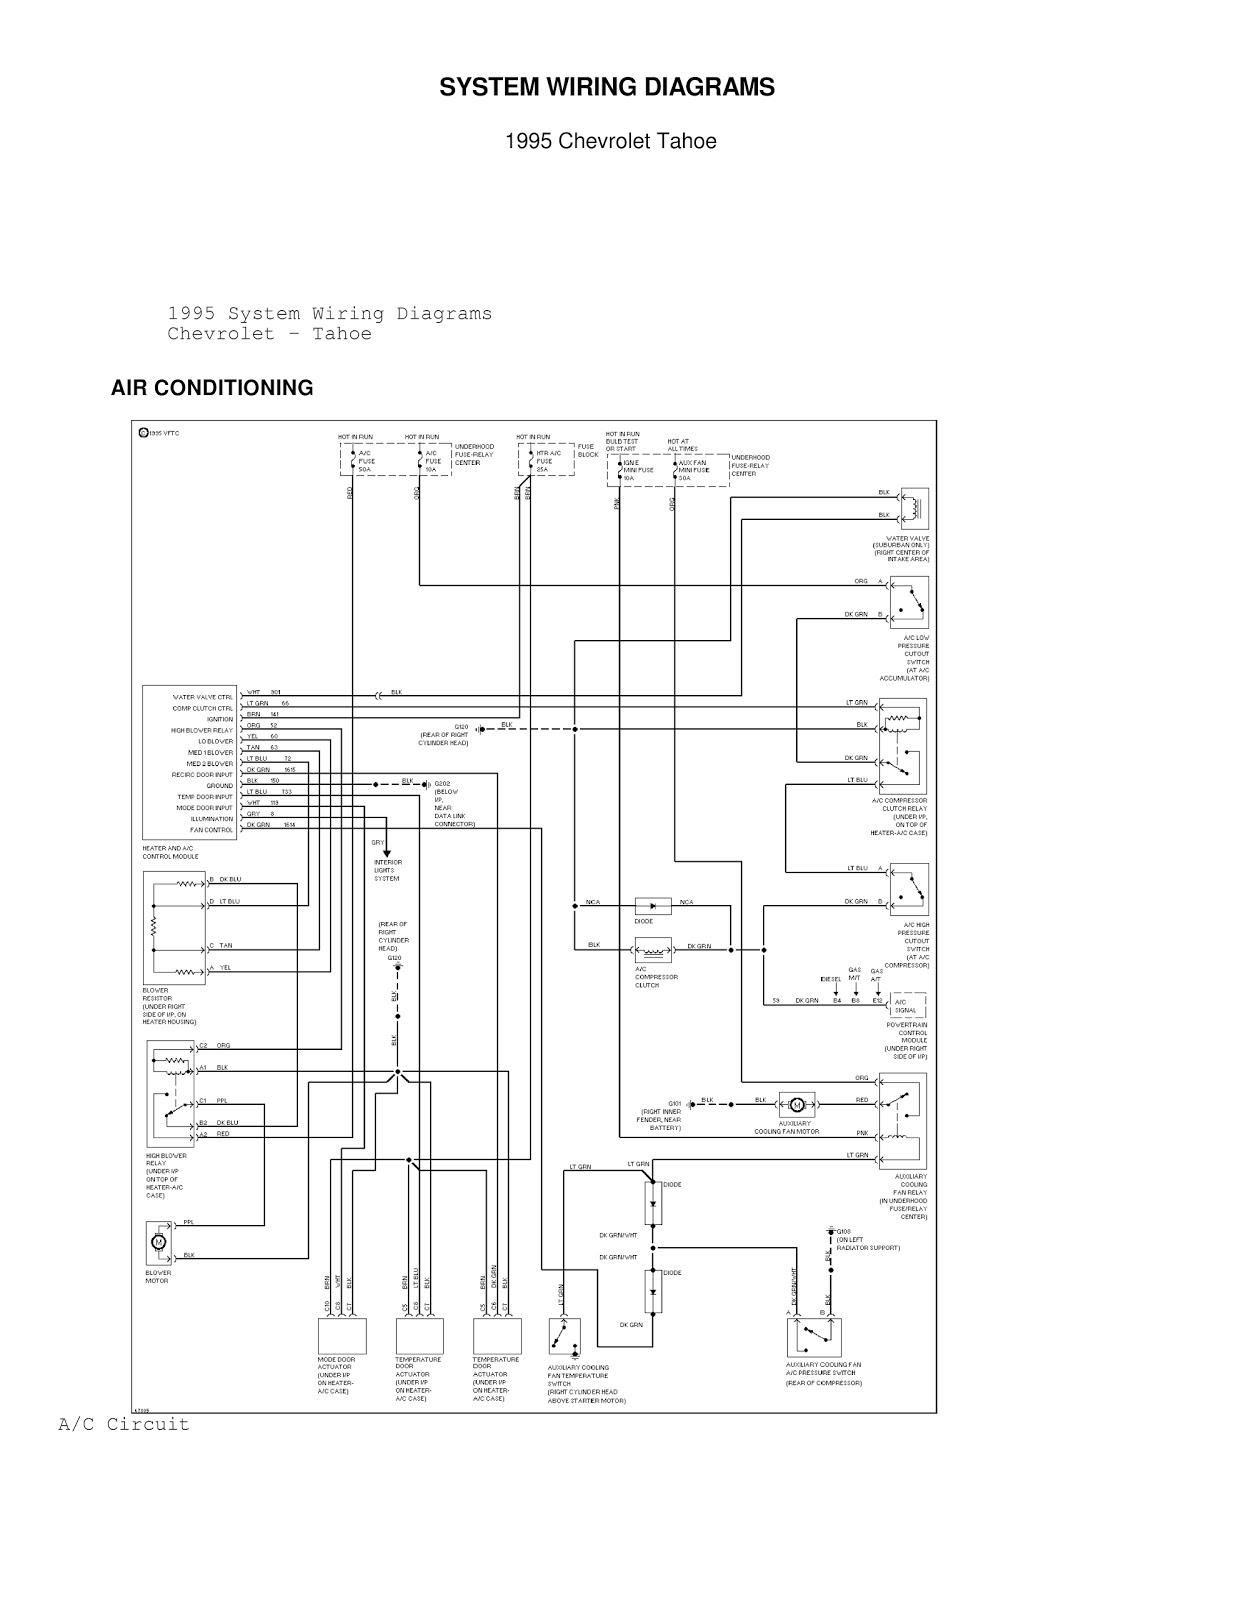 1995 Chevrolet Tahoe System Wiring Diagrams Air